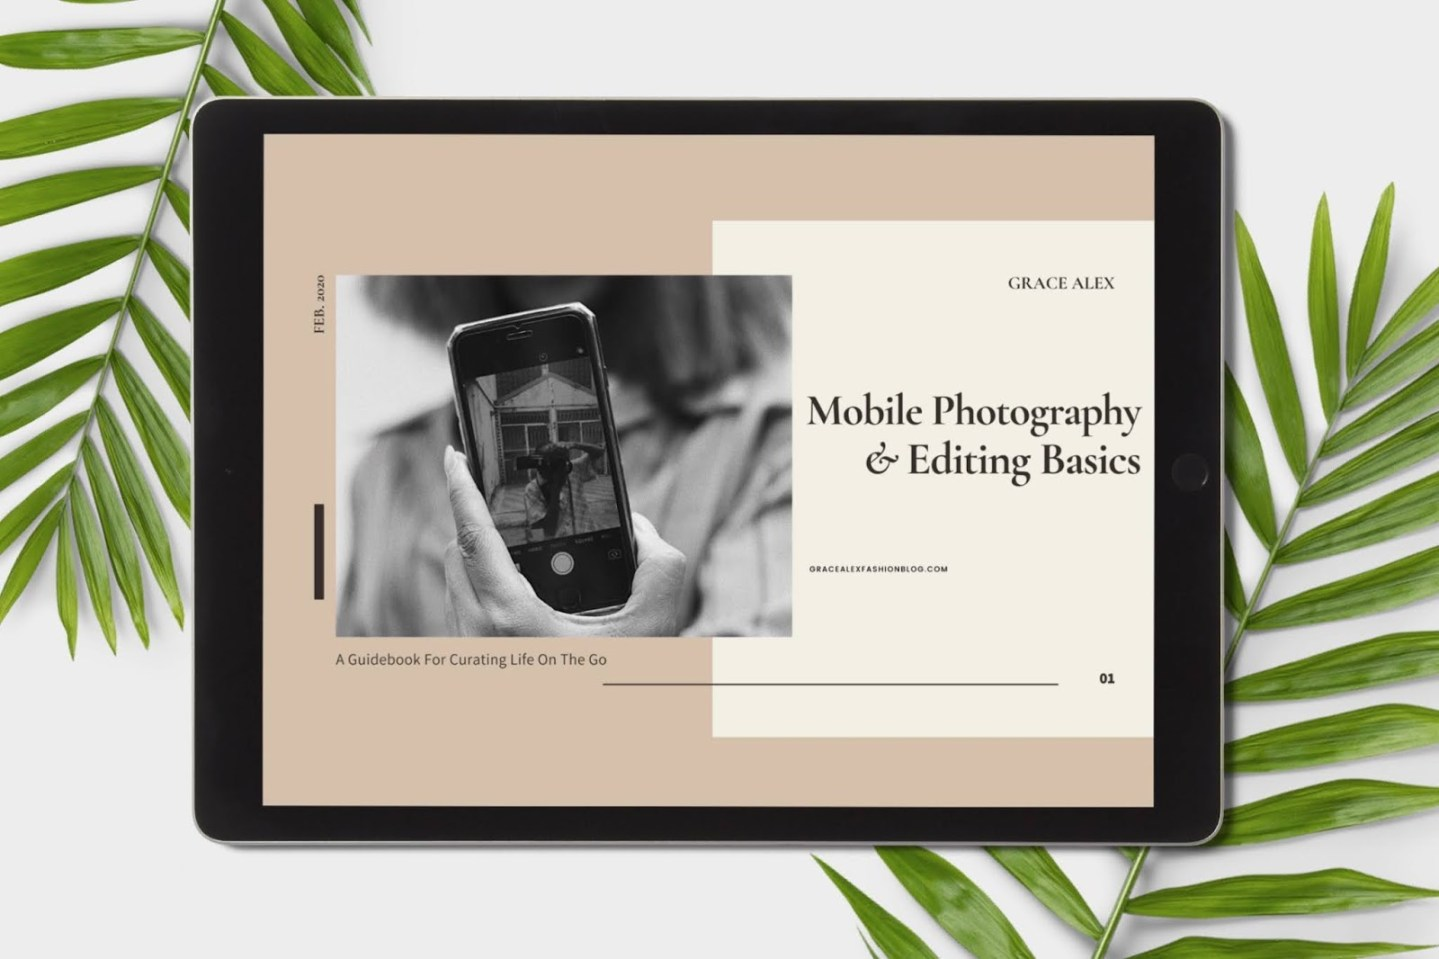 MOBILE PHOTOGRAPHY & EDITING BASICS E-BOOK